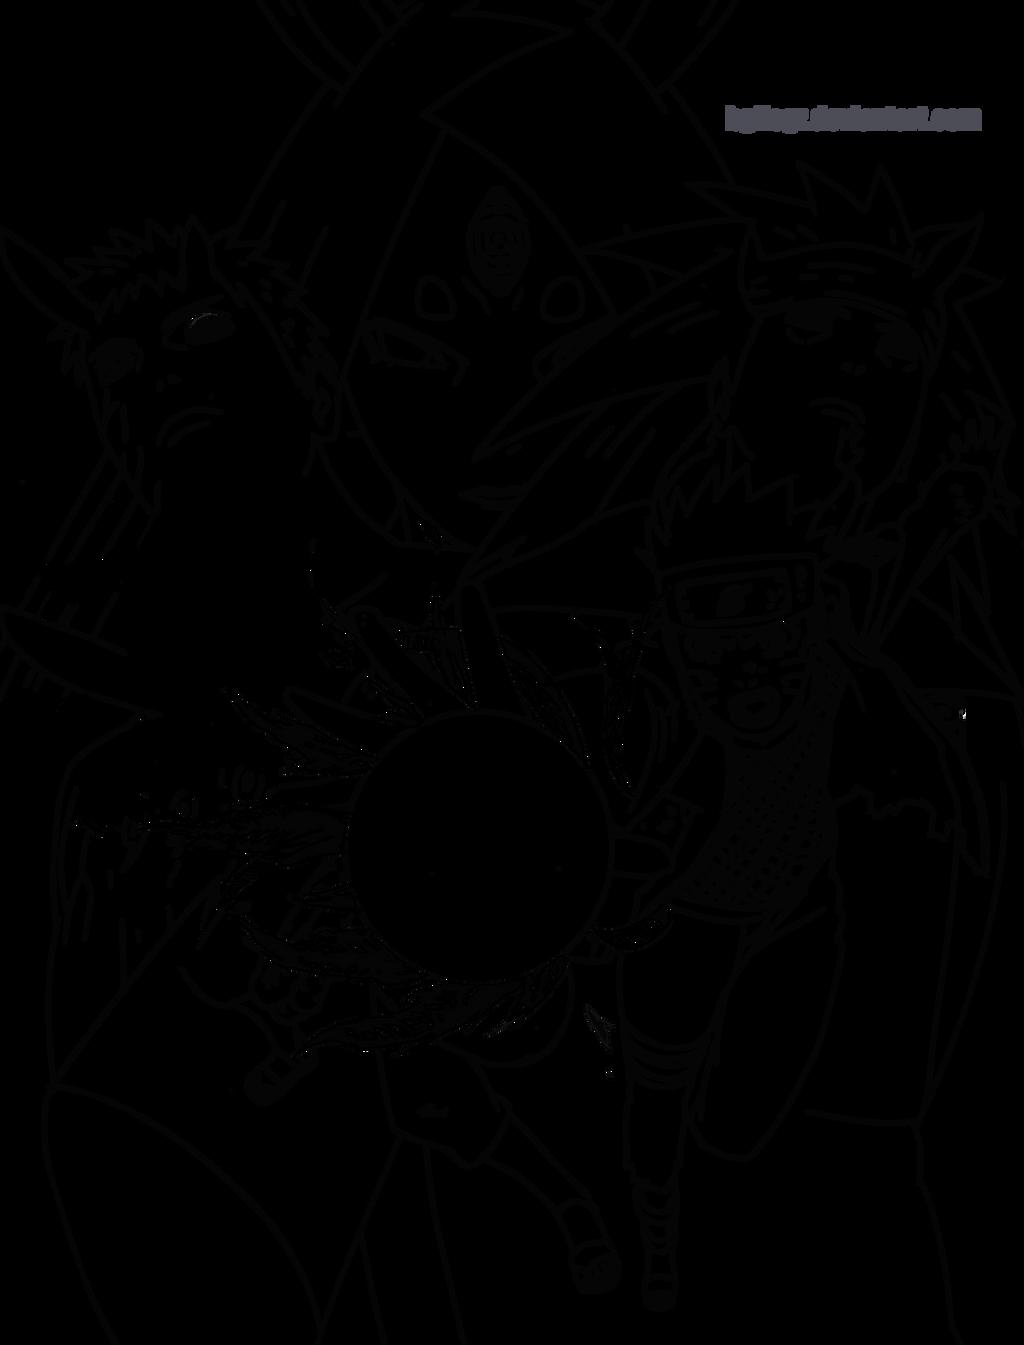 Naruto Shippuden Lineart : The gallery for gt naruto shippuden rasengan drawings